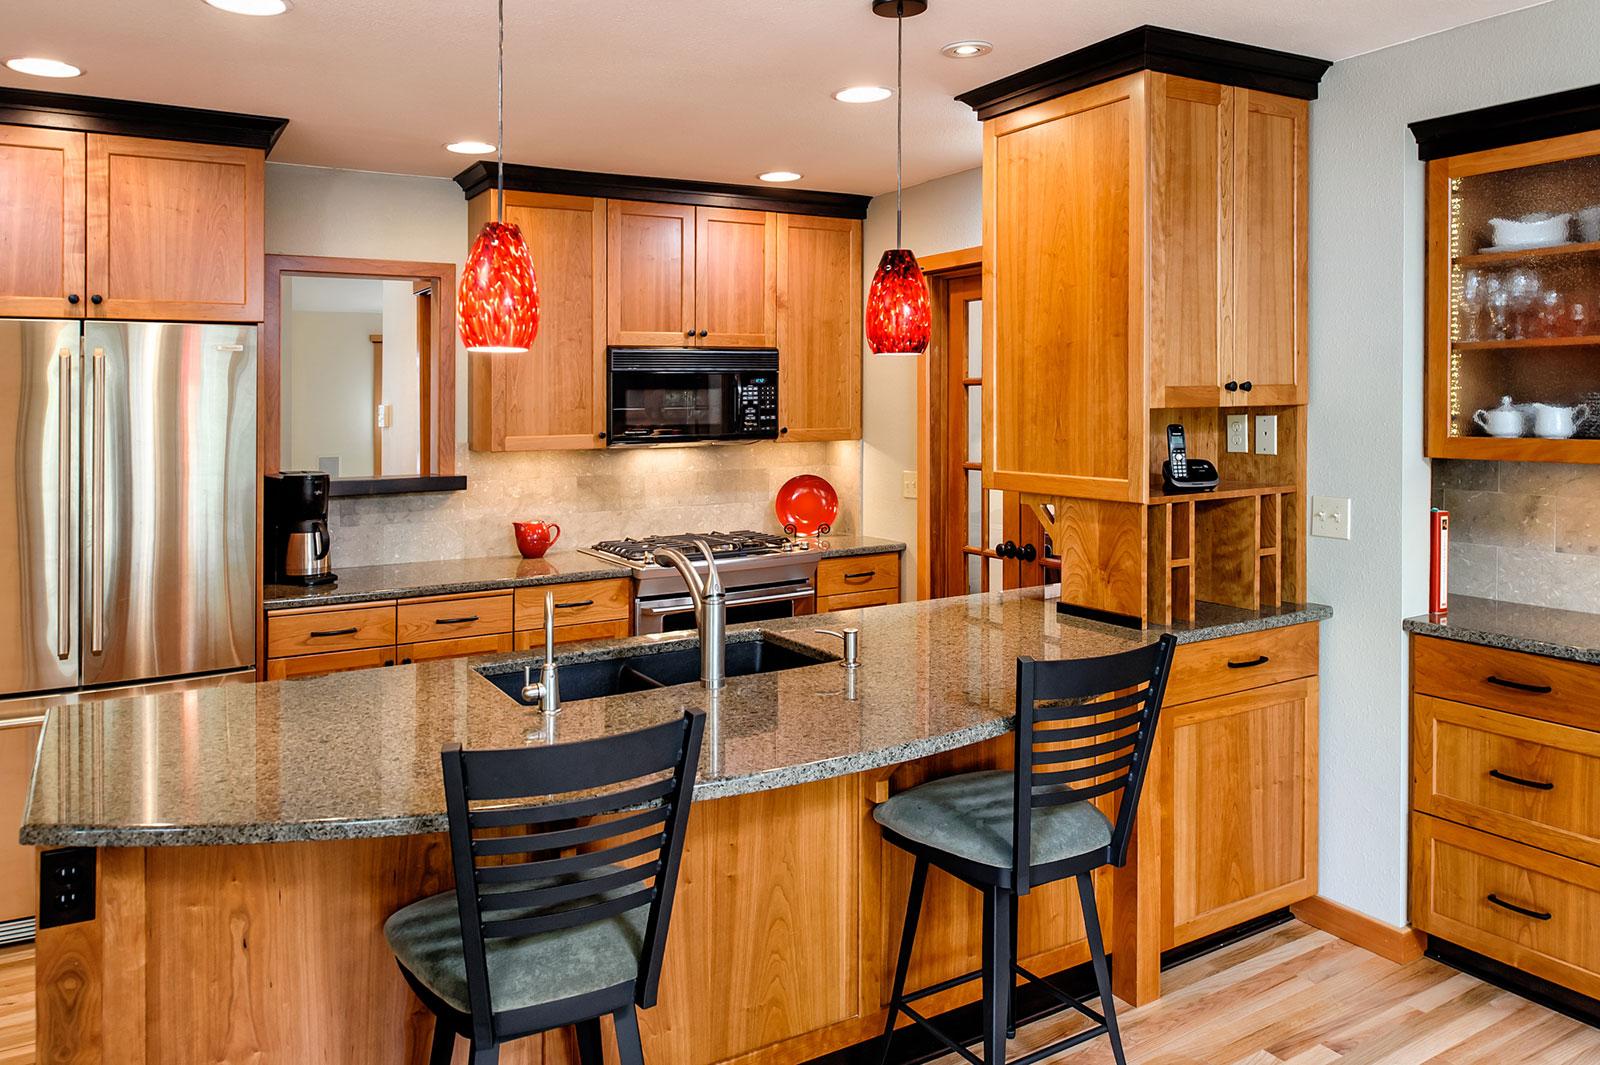 kitchen reno - Henderer Design + Build, Corvallis OR